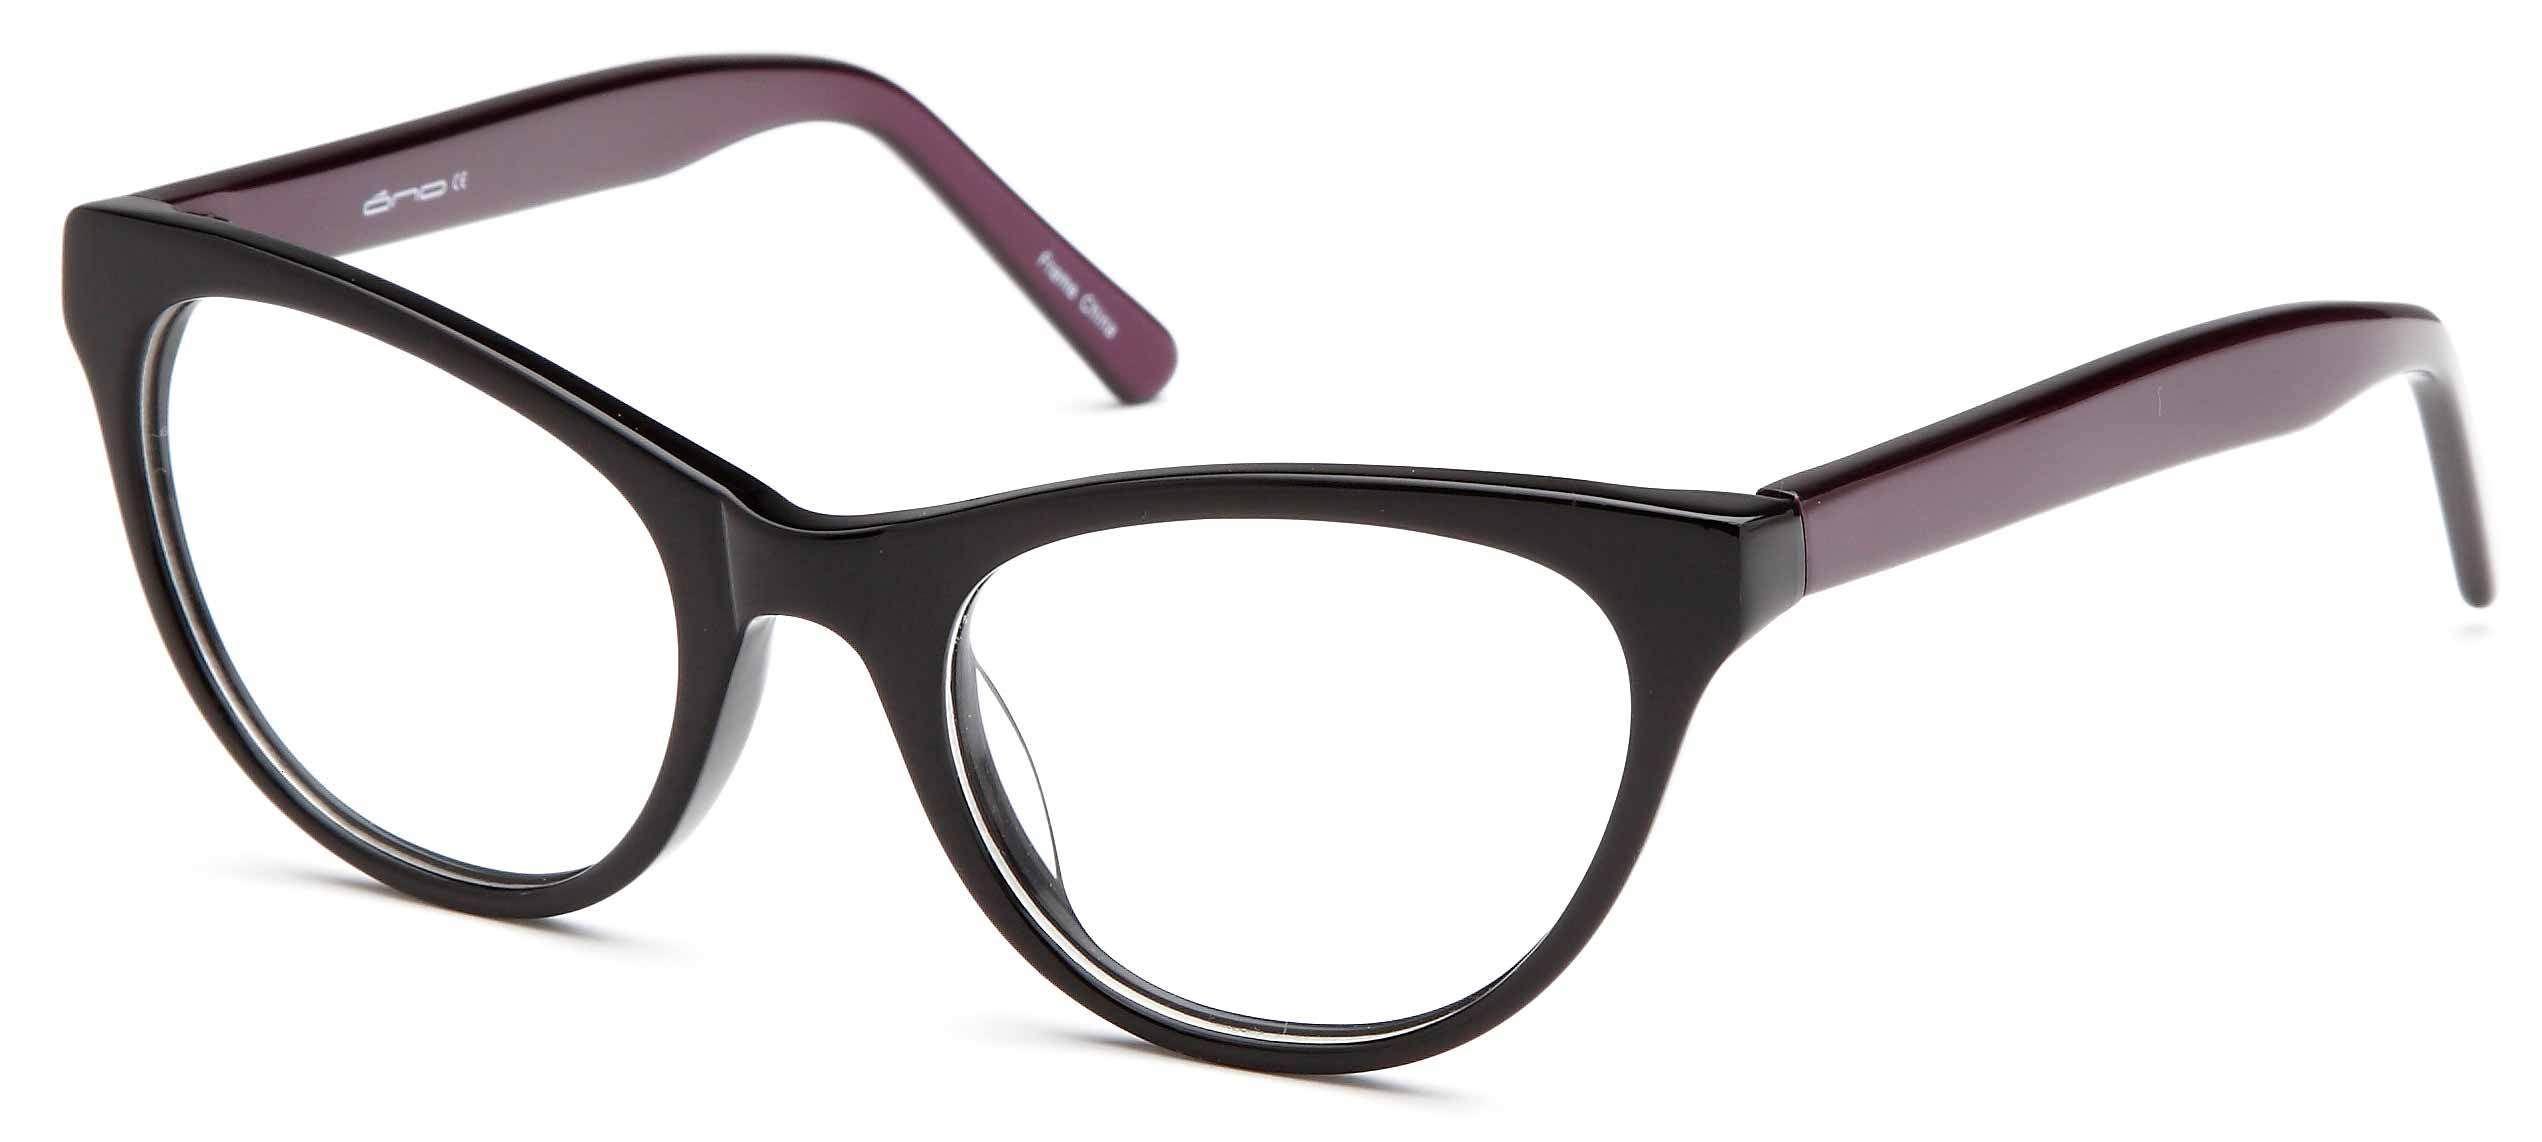 25d56720703a DALIX Womens Cat Eye Two Toned Prescription Glasses Frames Eyeglasses